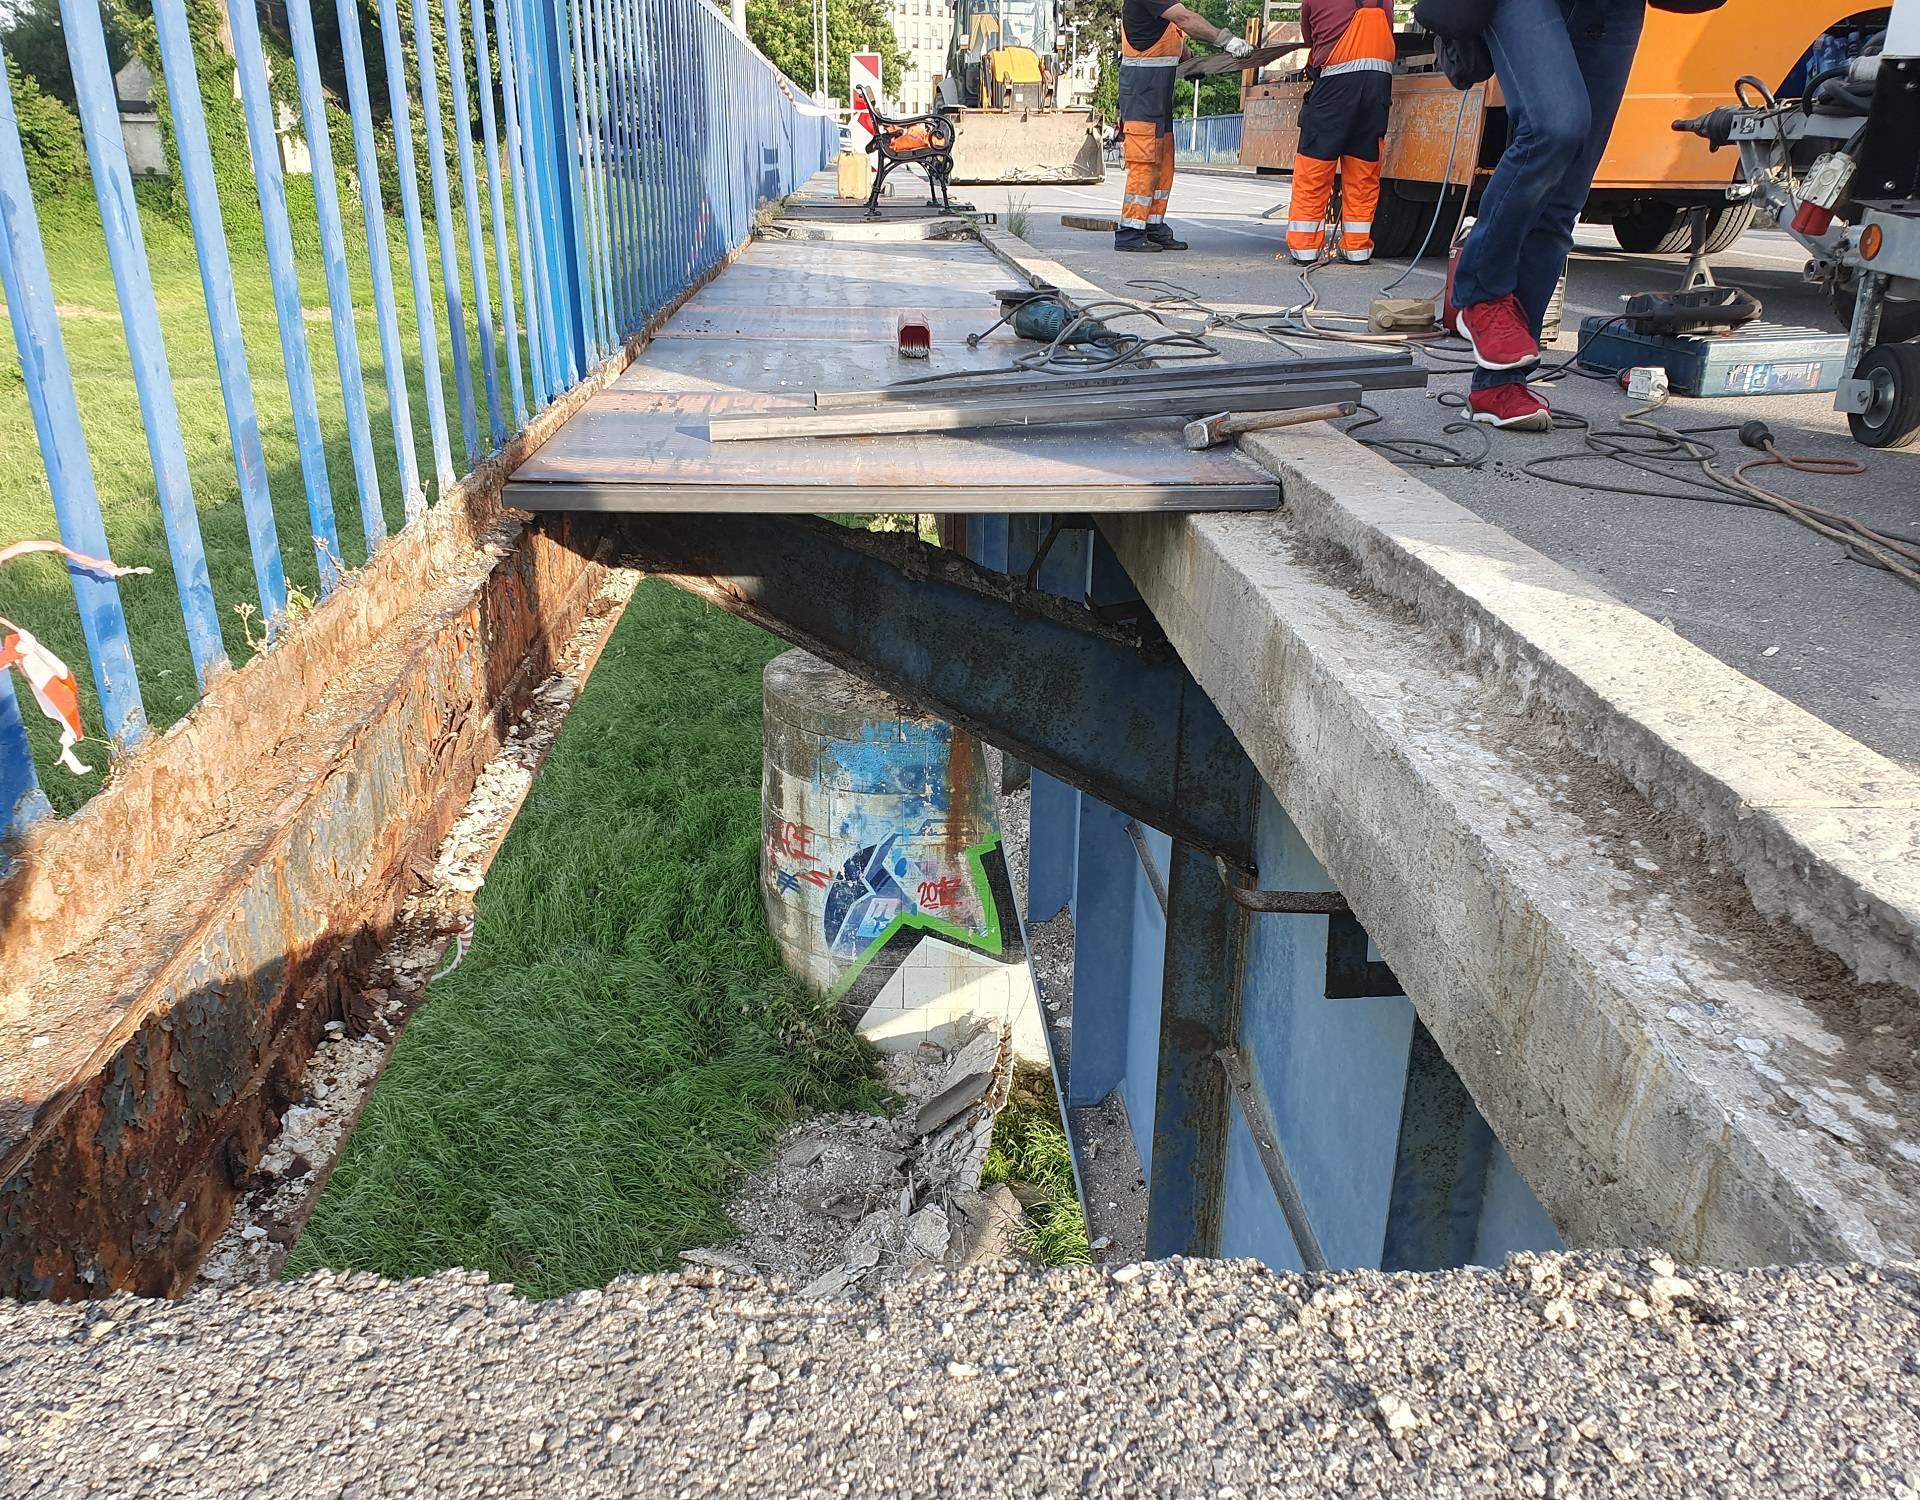 'Ništa od obnove, ovu rupu na mostu bumo tek malo pokrpali'